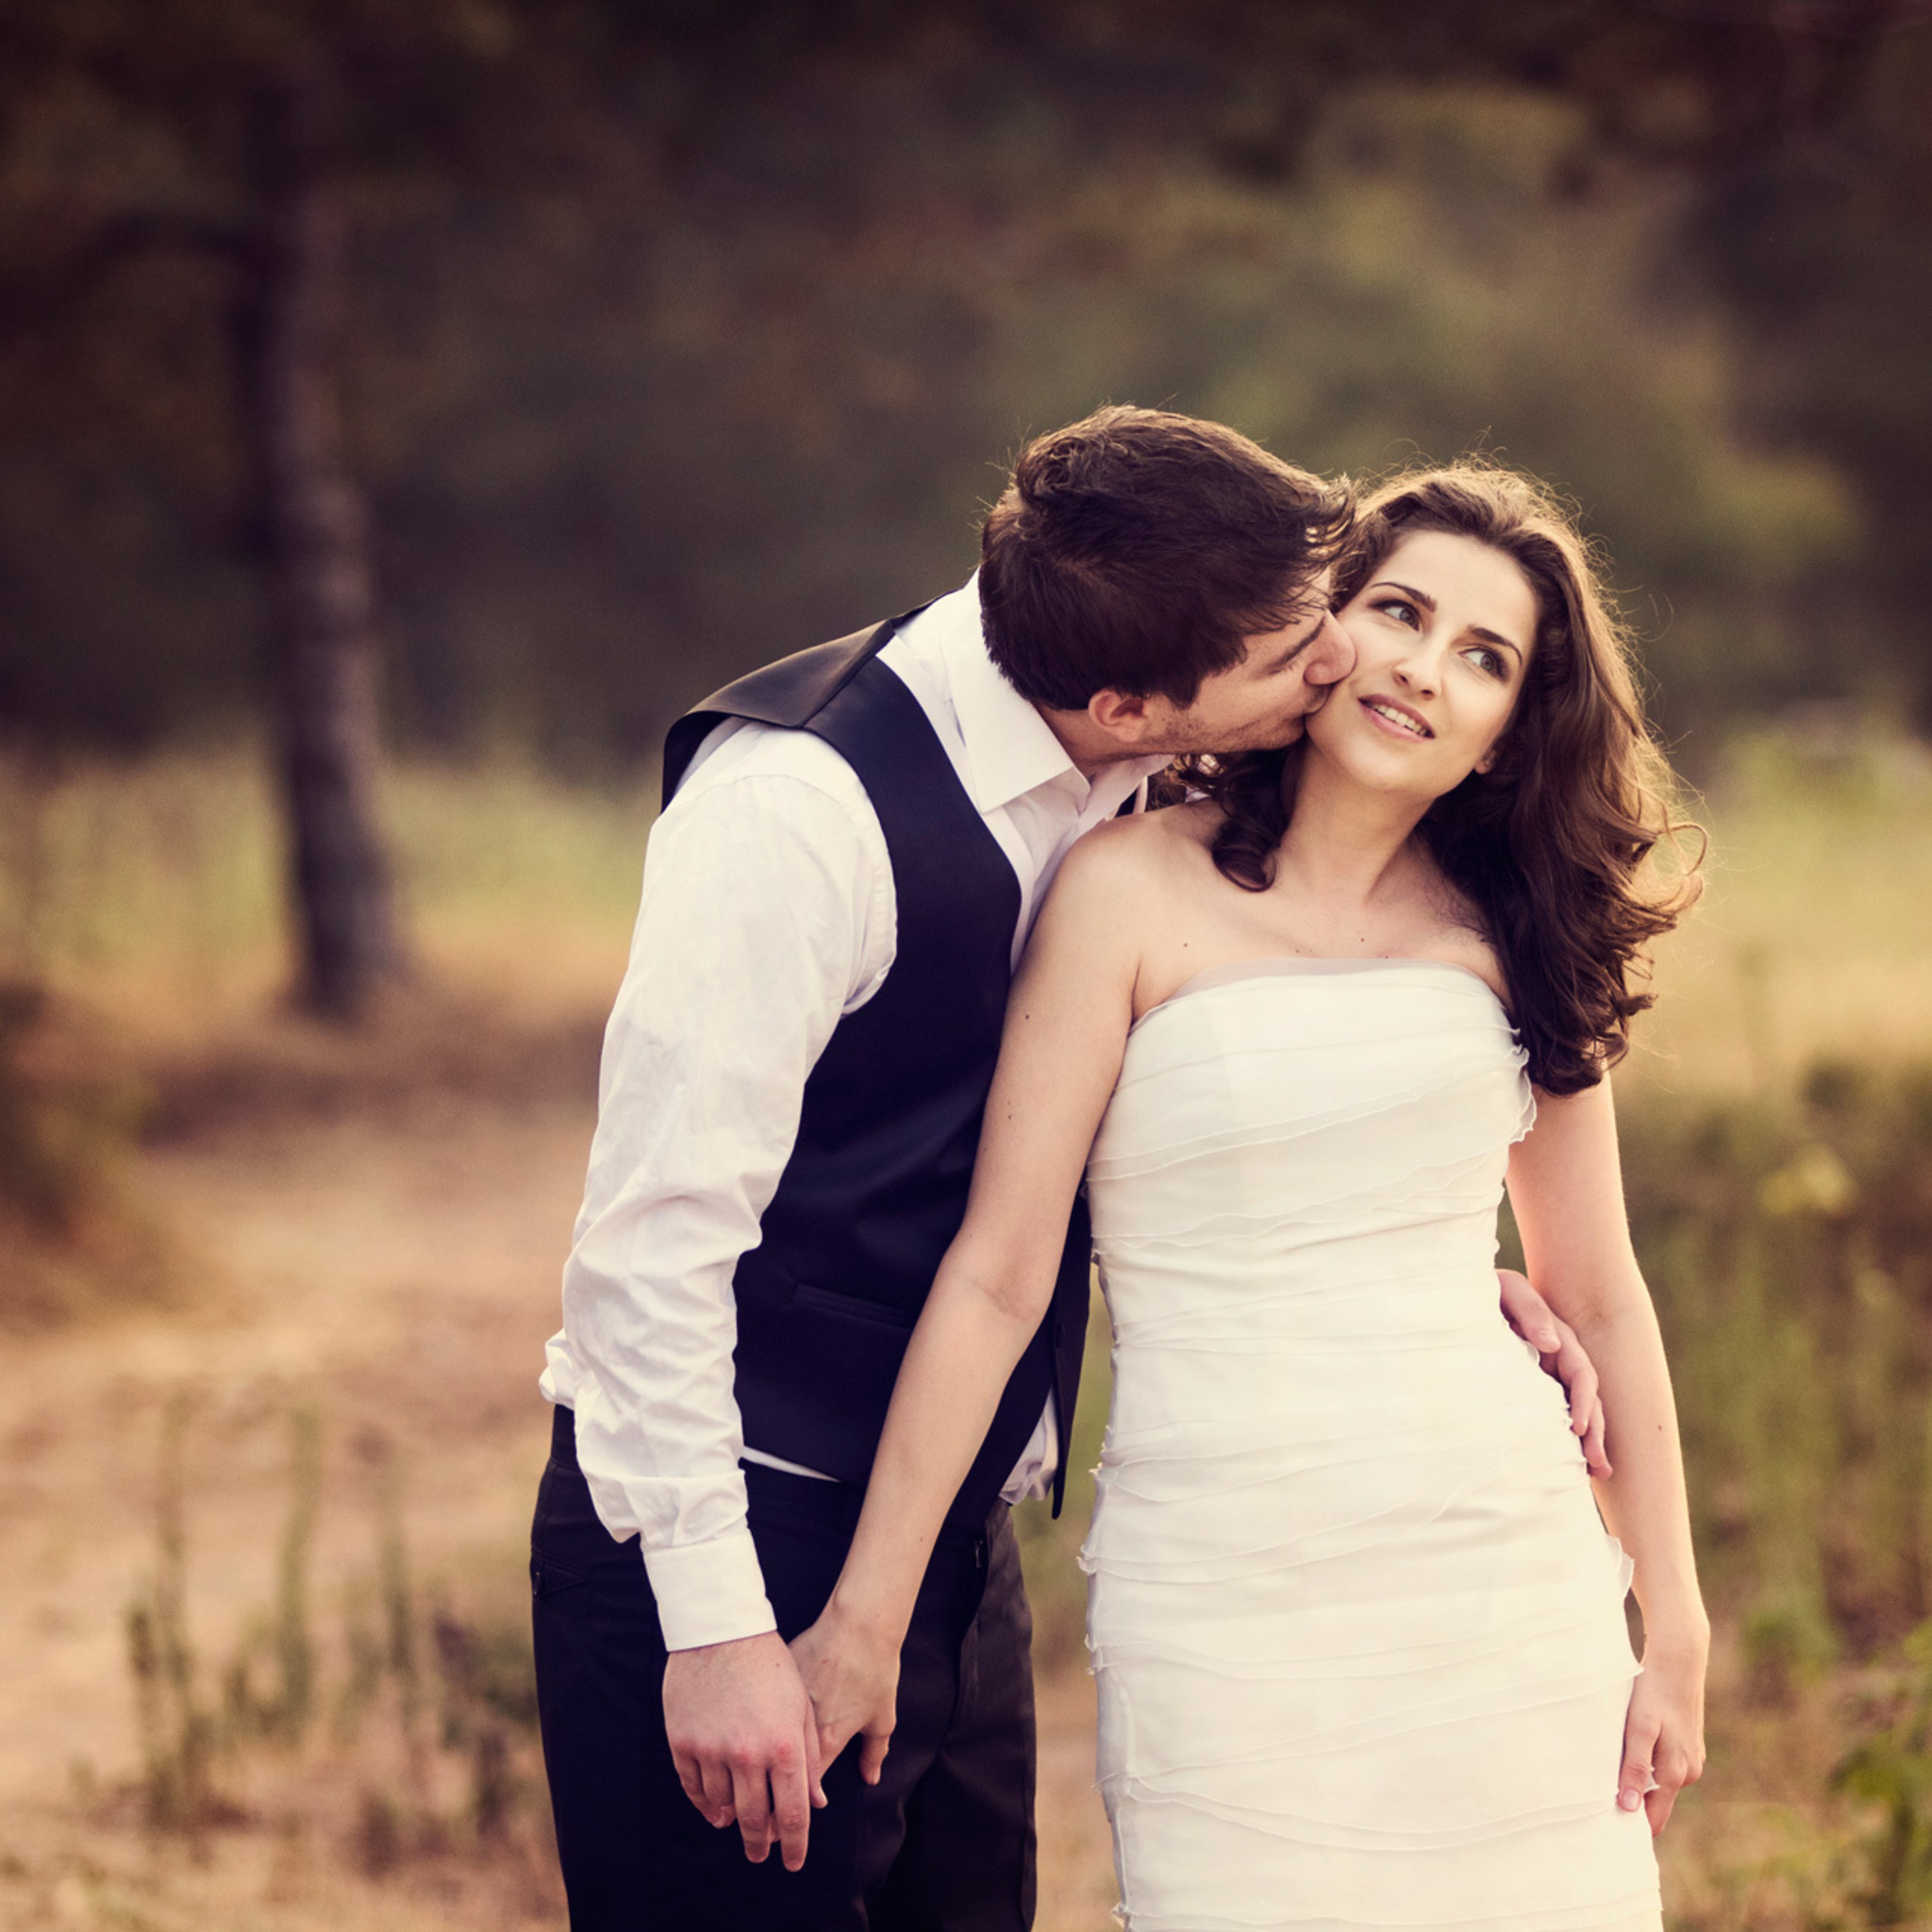 2048x2048 couple kissing ipad air hd 4k wallpapers images - 4k kiss wallpaper ...